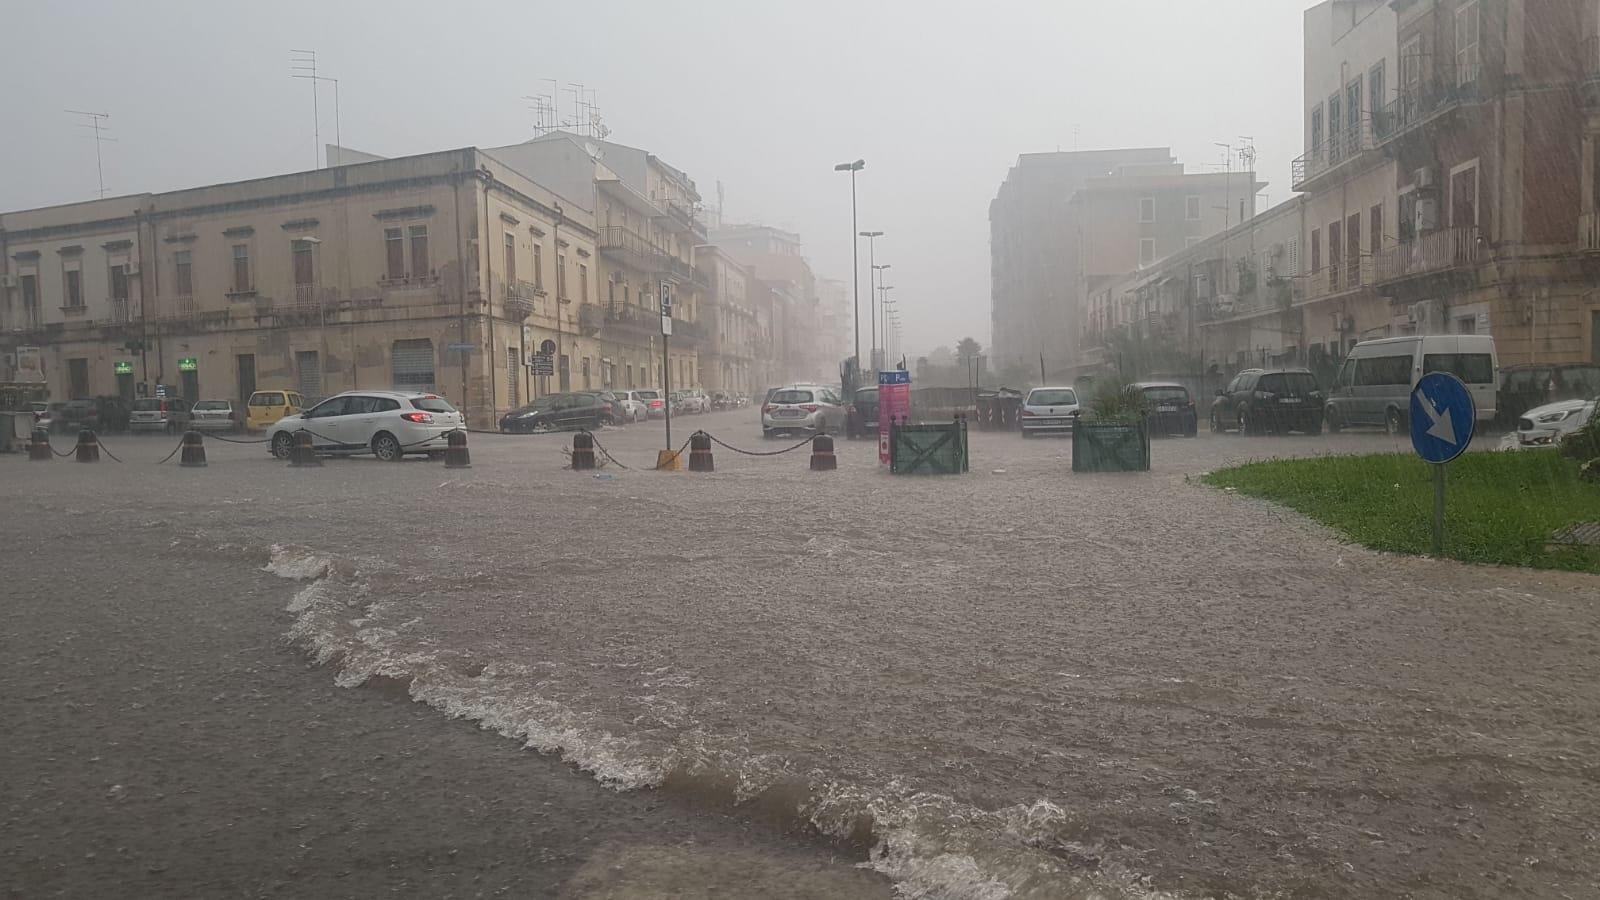 Bomba d'acqua su Siracusa : strade allagate, disagi e traffico in tilt. LE  IMMAGINI – SiracusaOggi.it